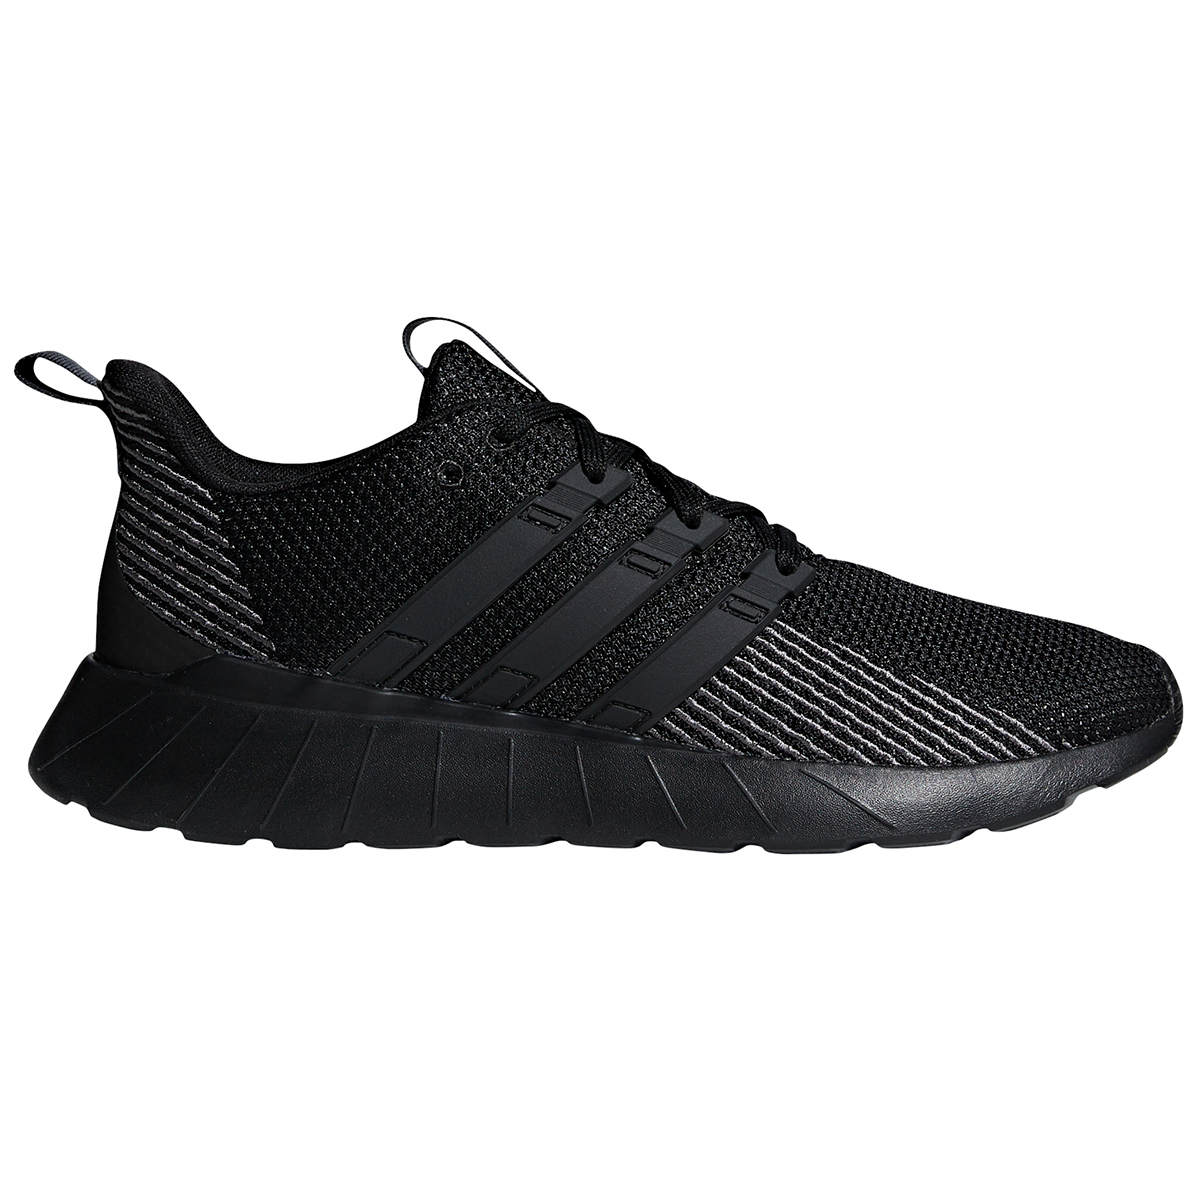 Adidas Men's Questar Flow Running Shoes - Black, 13